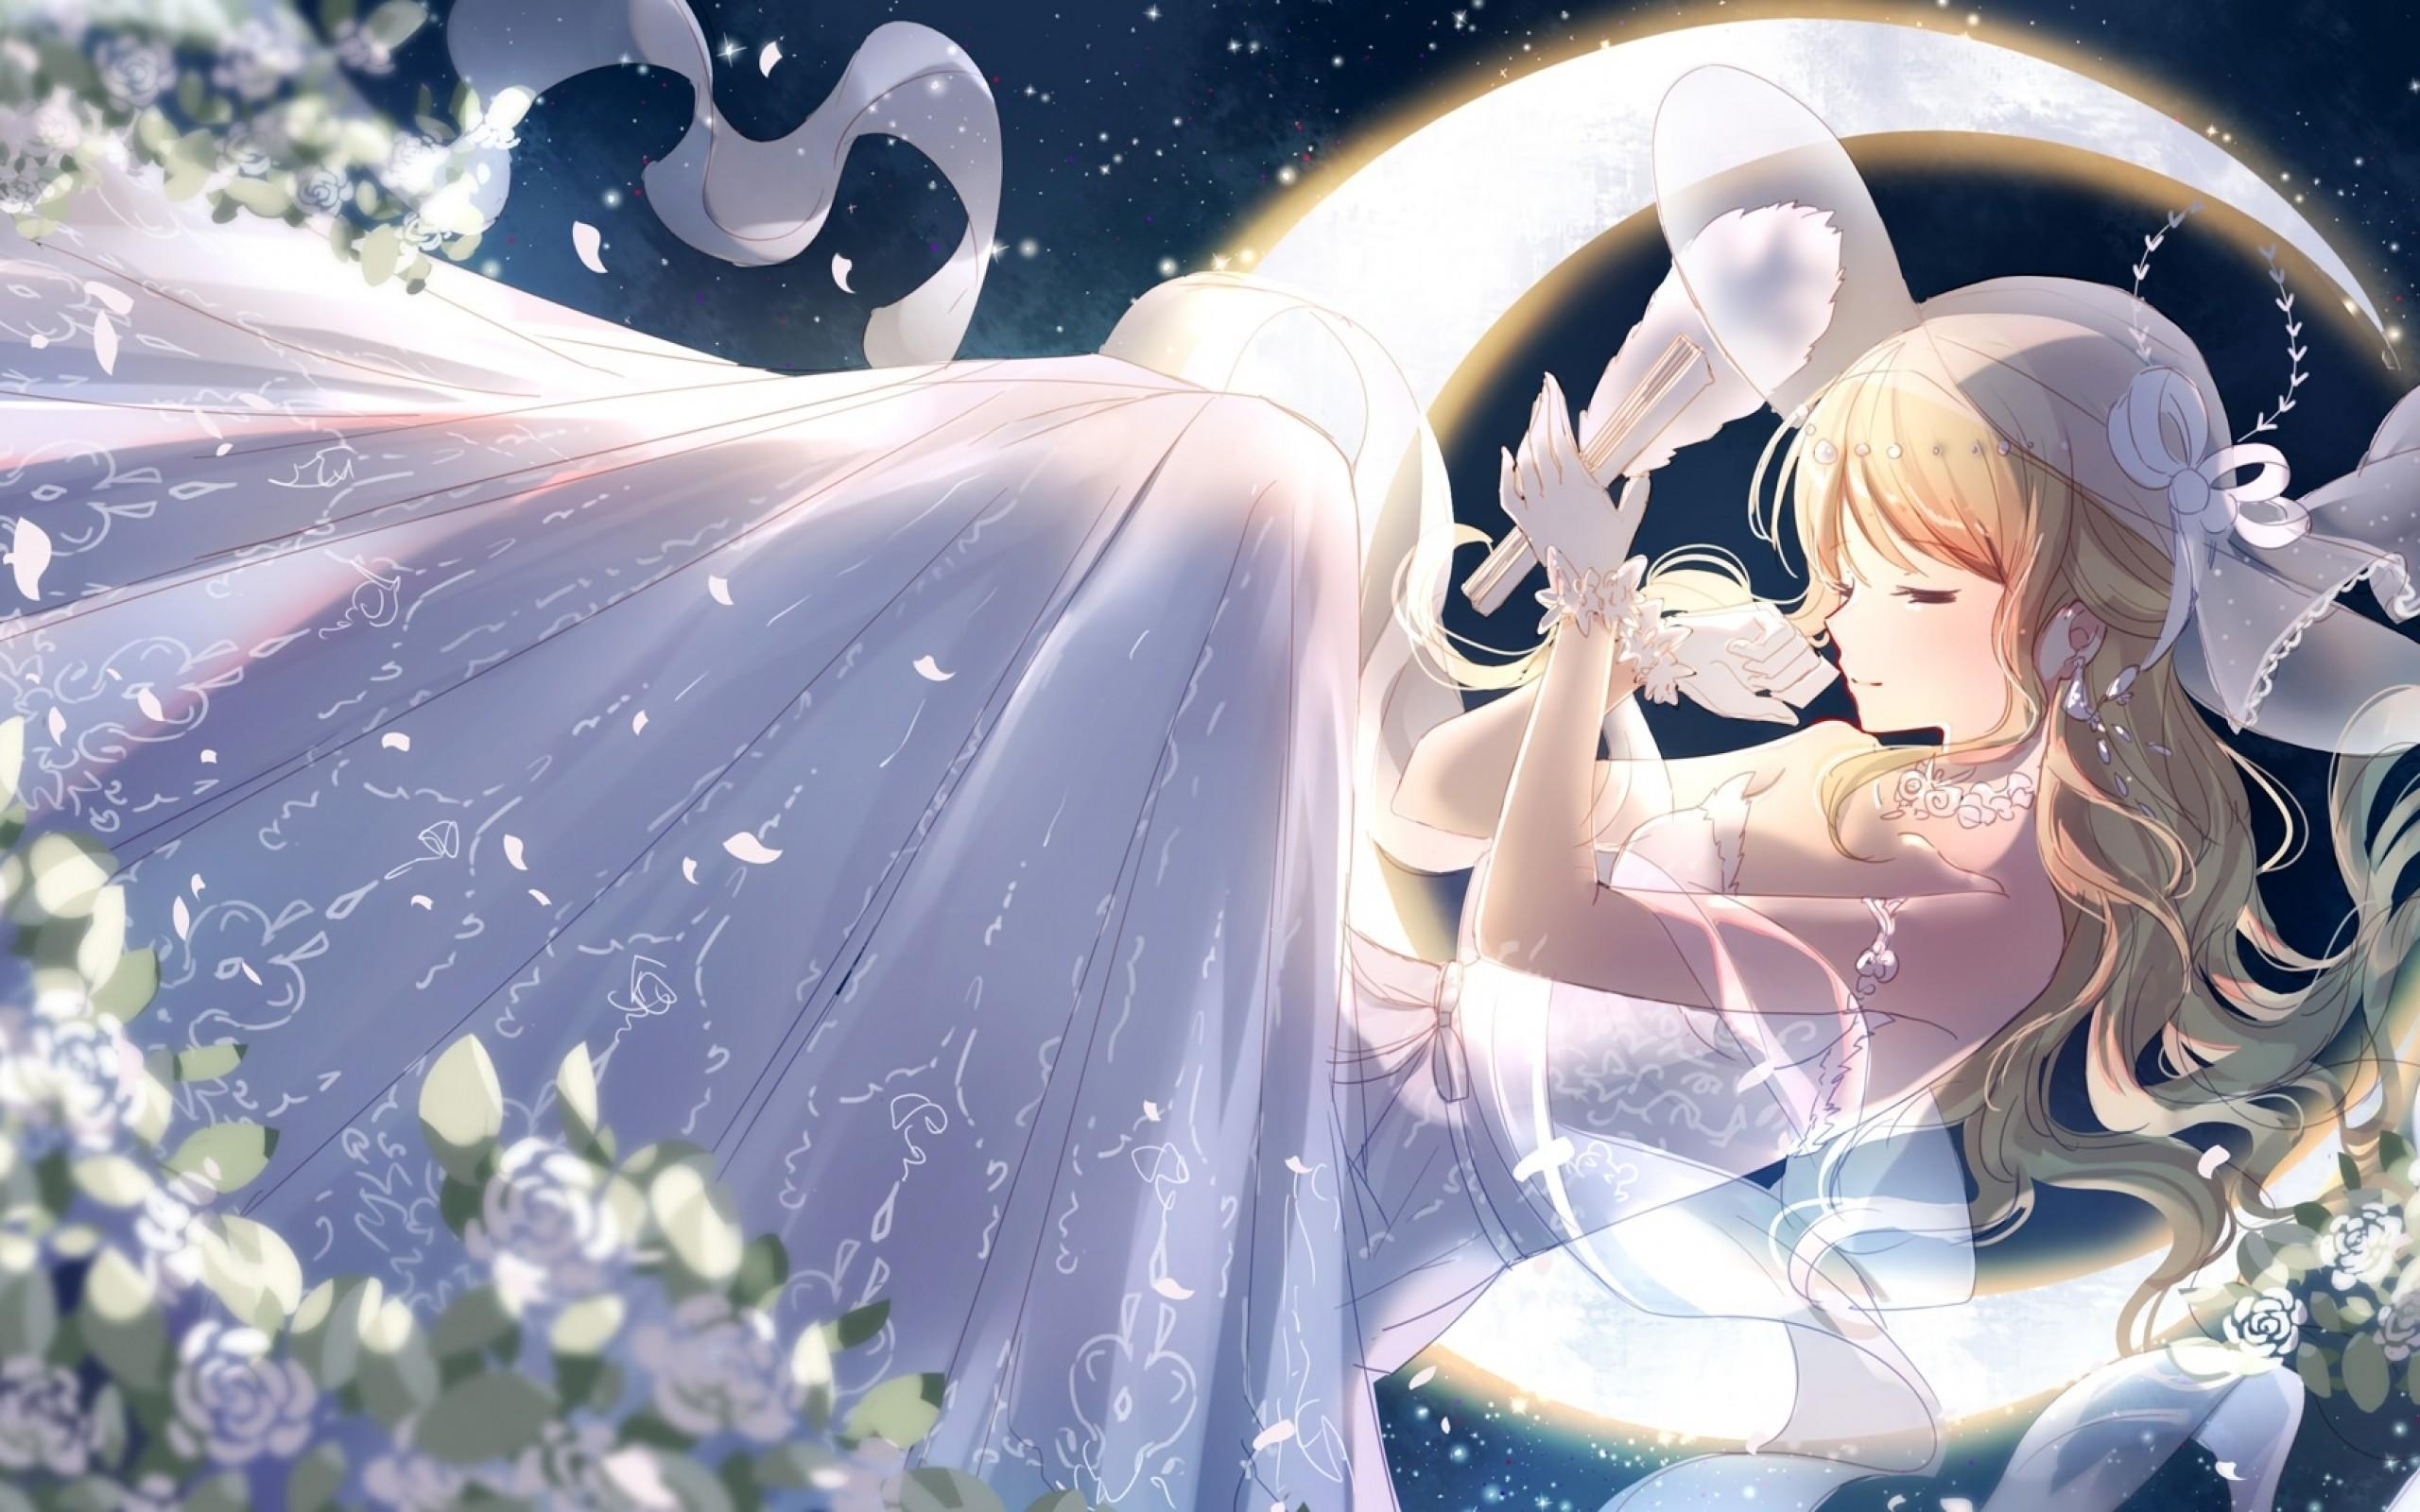 Anime Girl Wedding Wallpapers - Wallpaper Cave